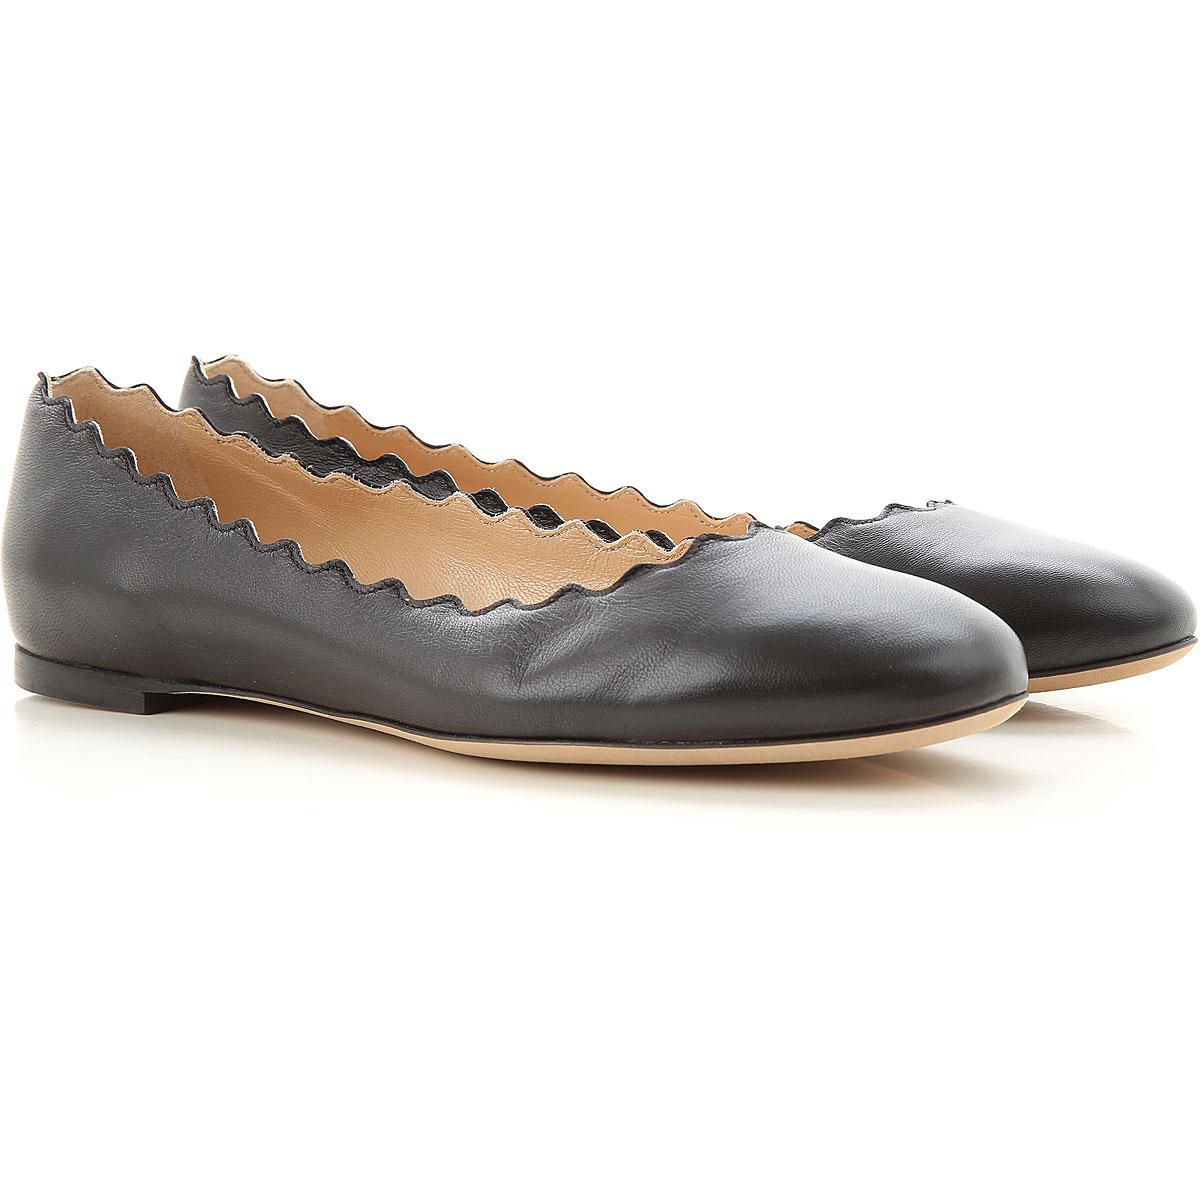 Chloe Ballet Flats Ballerina Shoes for Women On Sale, Black, Leather, 2019, 5.5 6 6.5 7